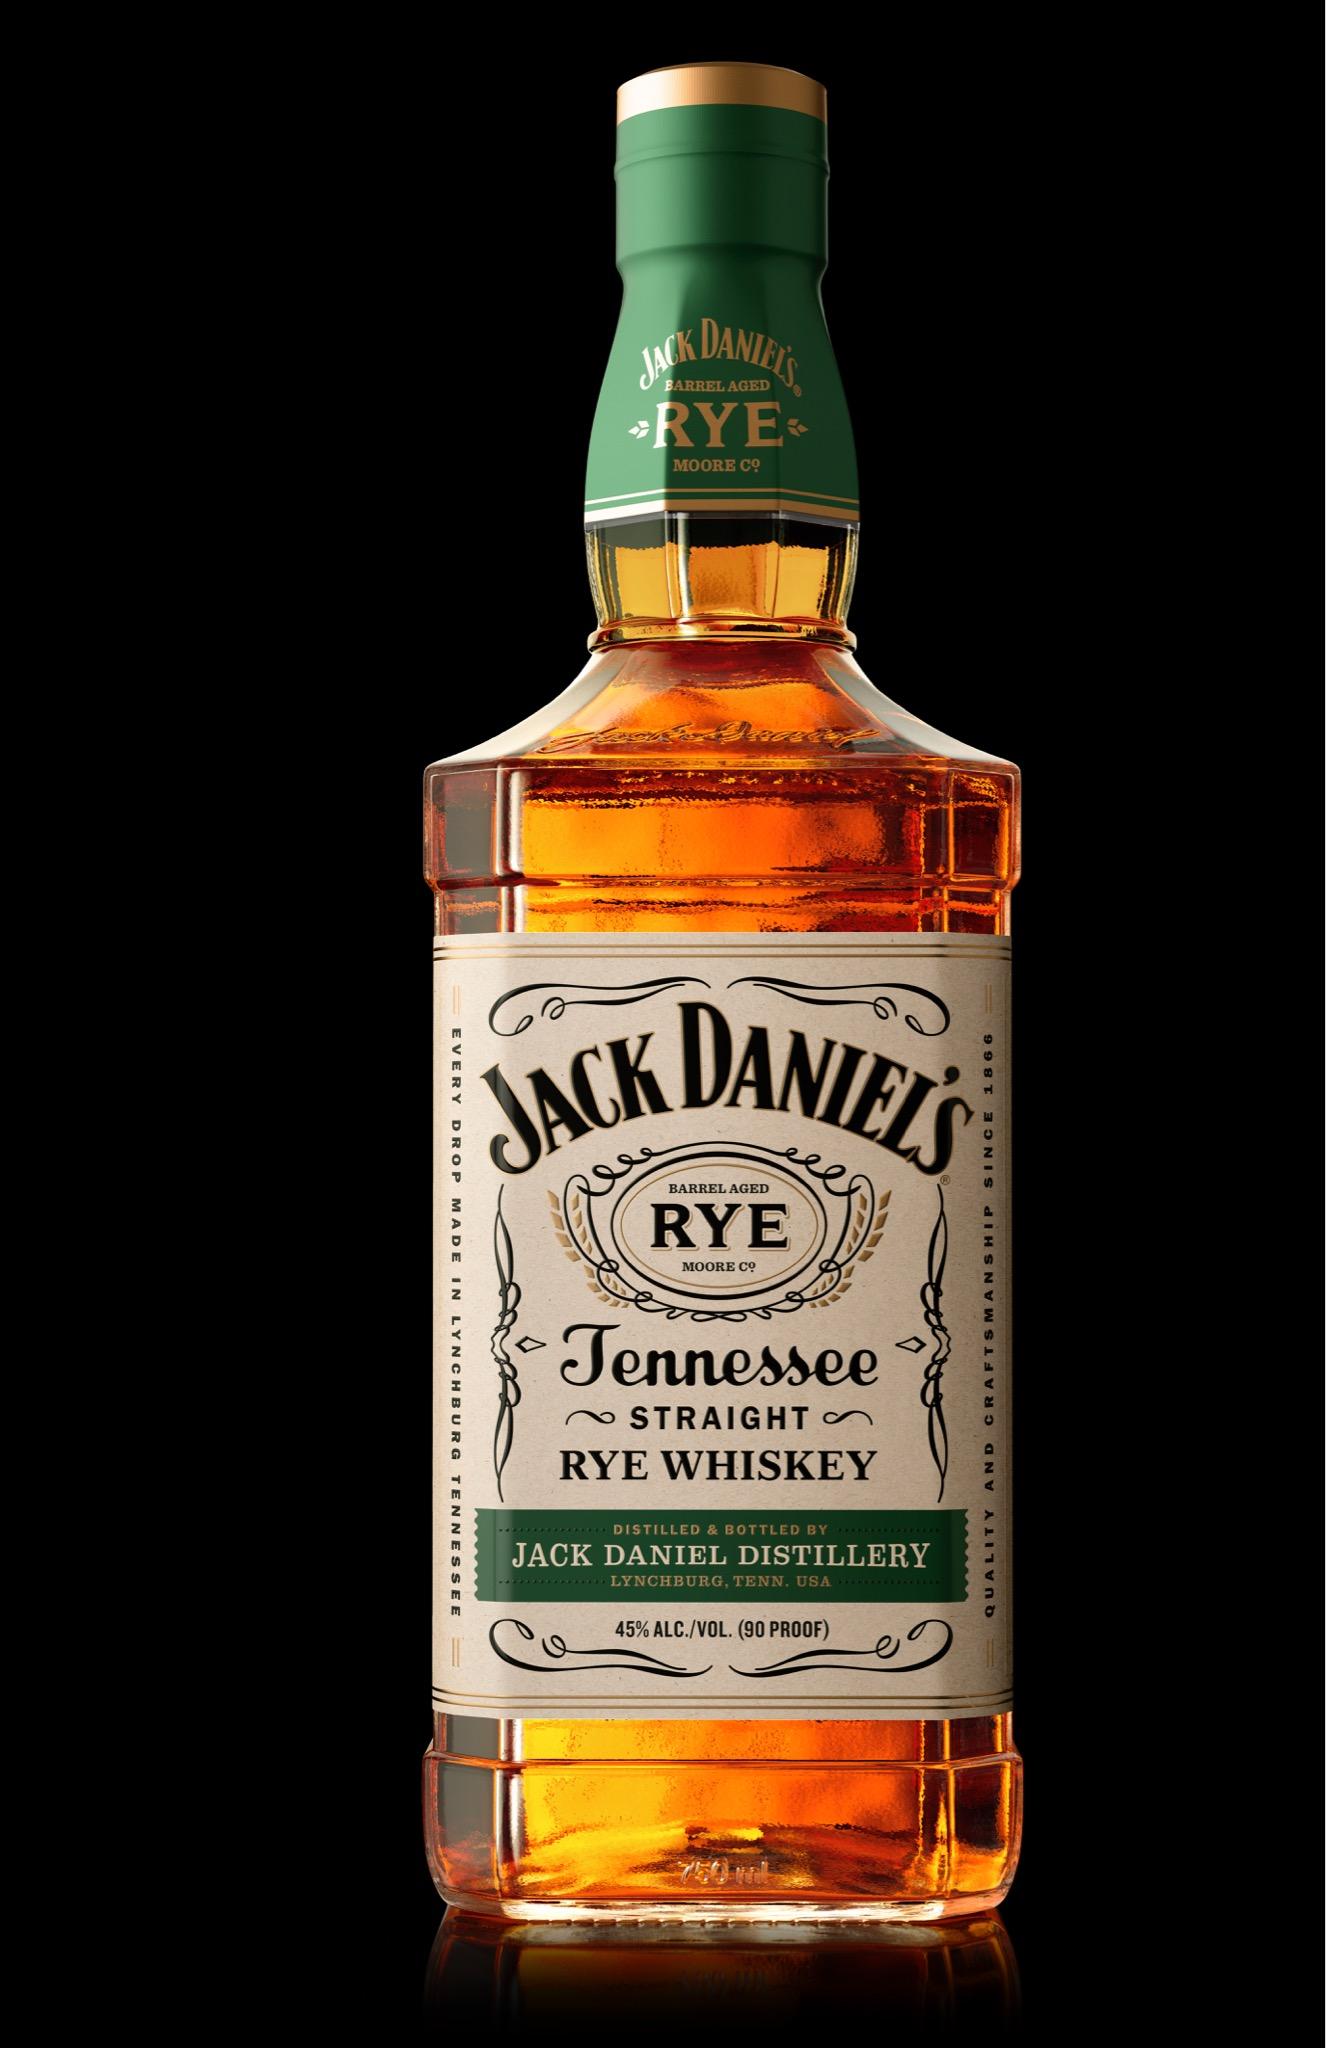 jack daniel whisky